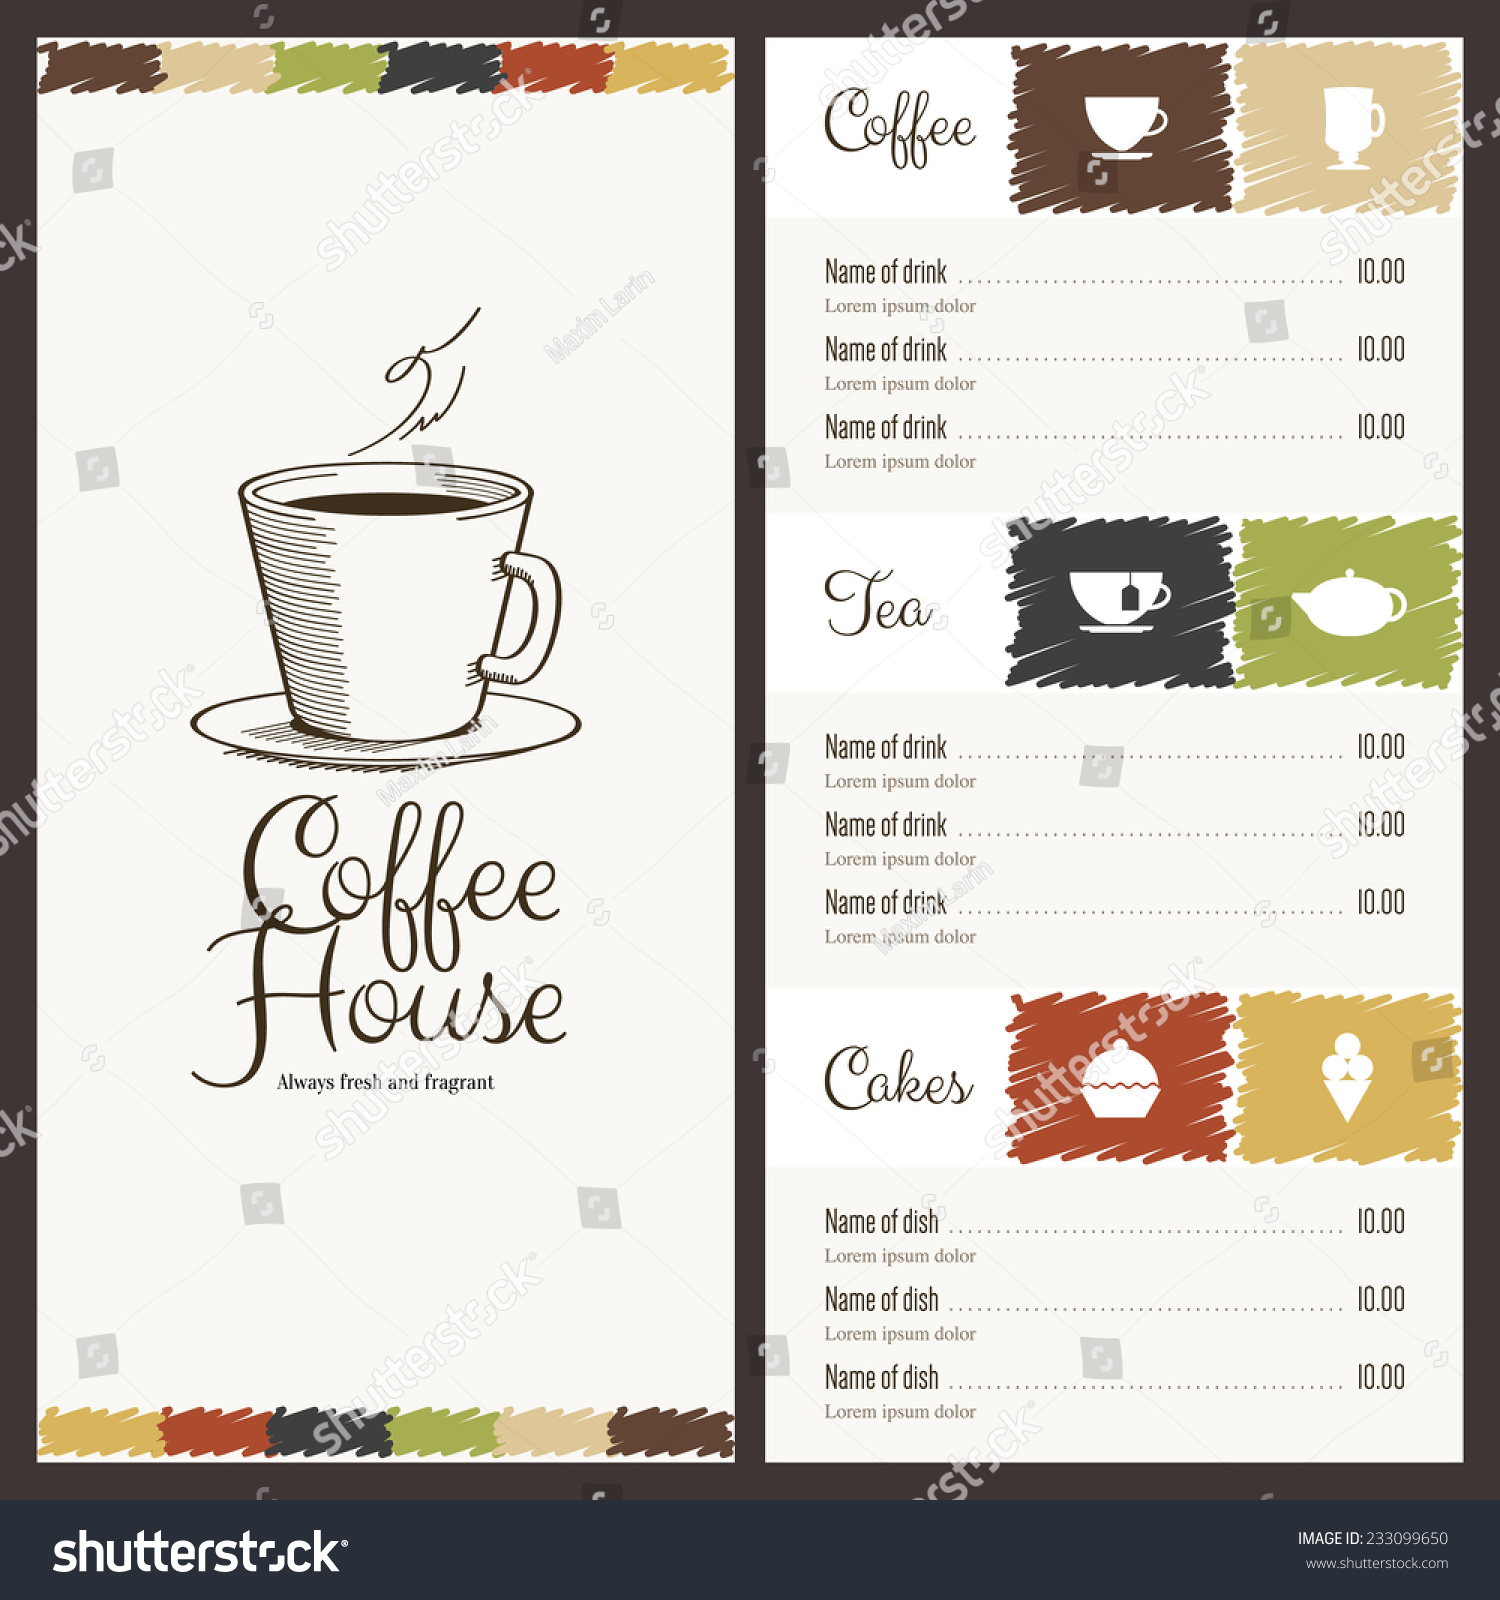 Restaurant coffee house menu design vector stock